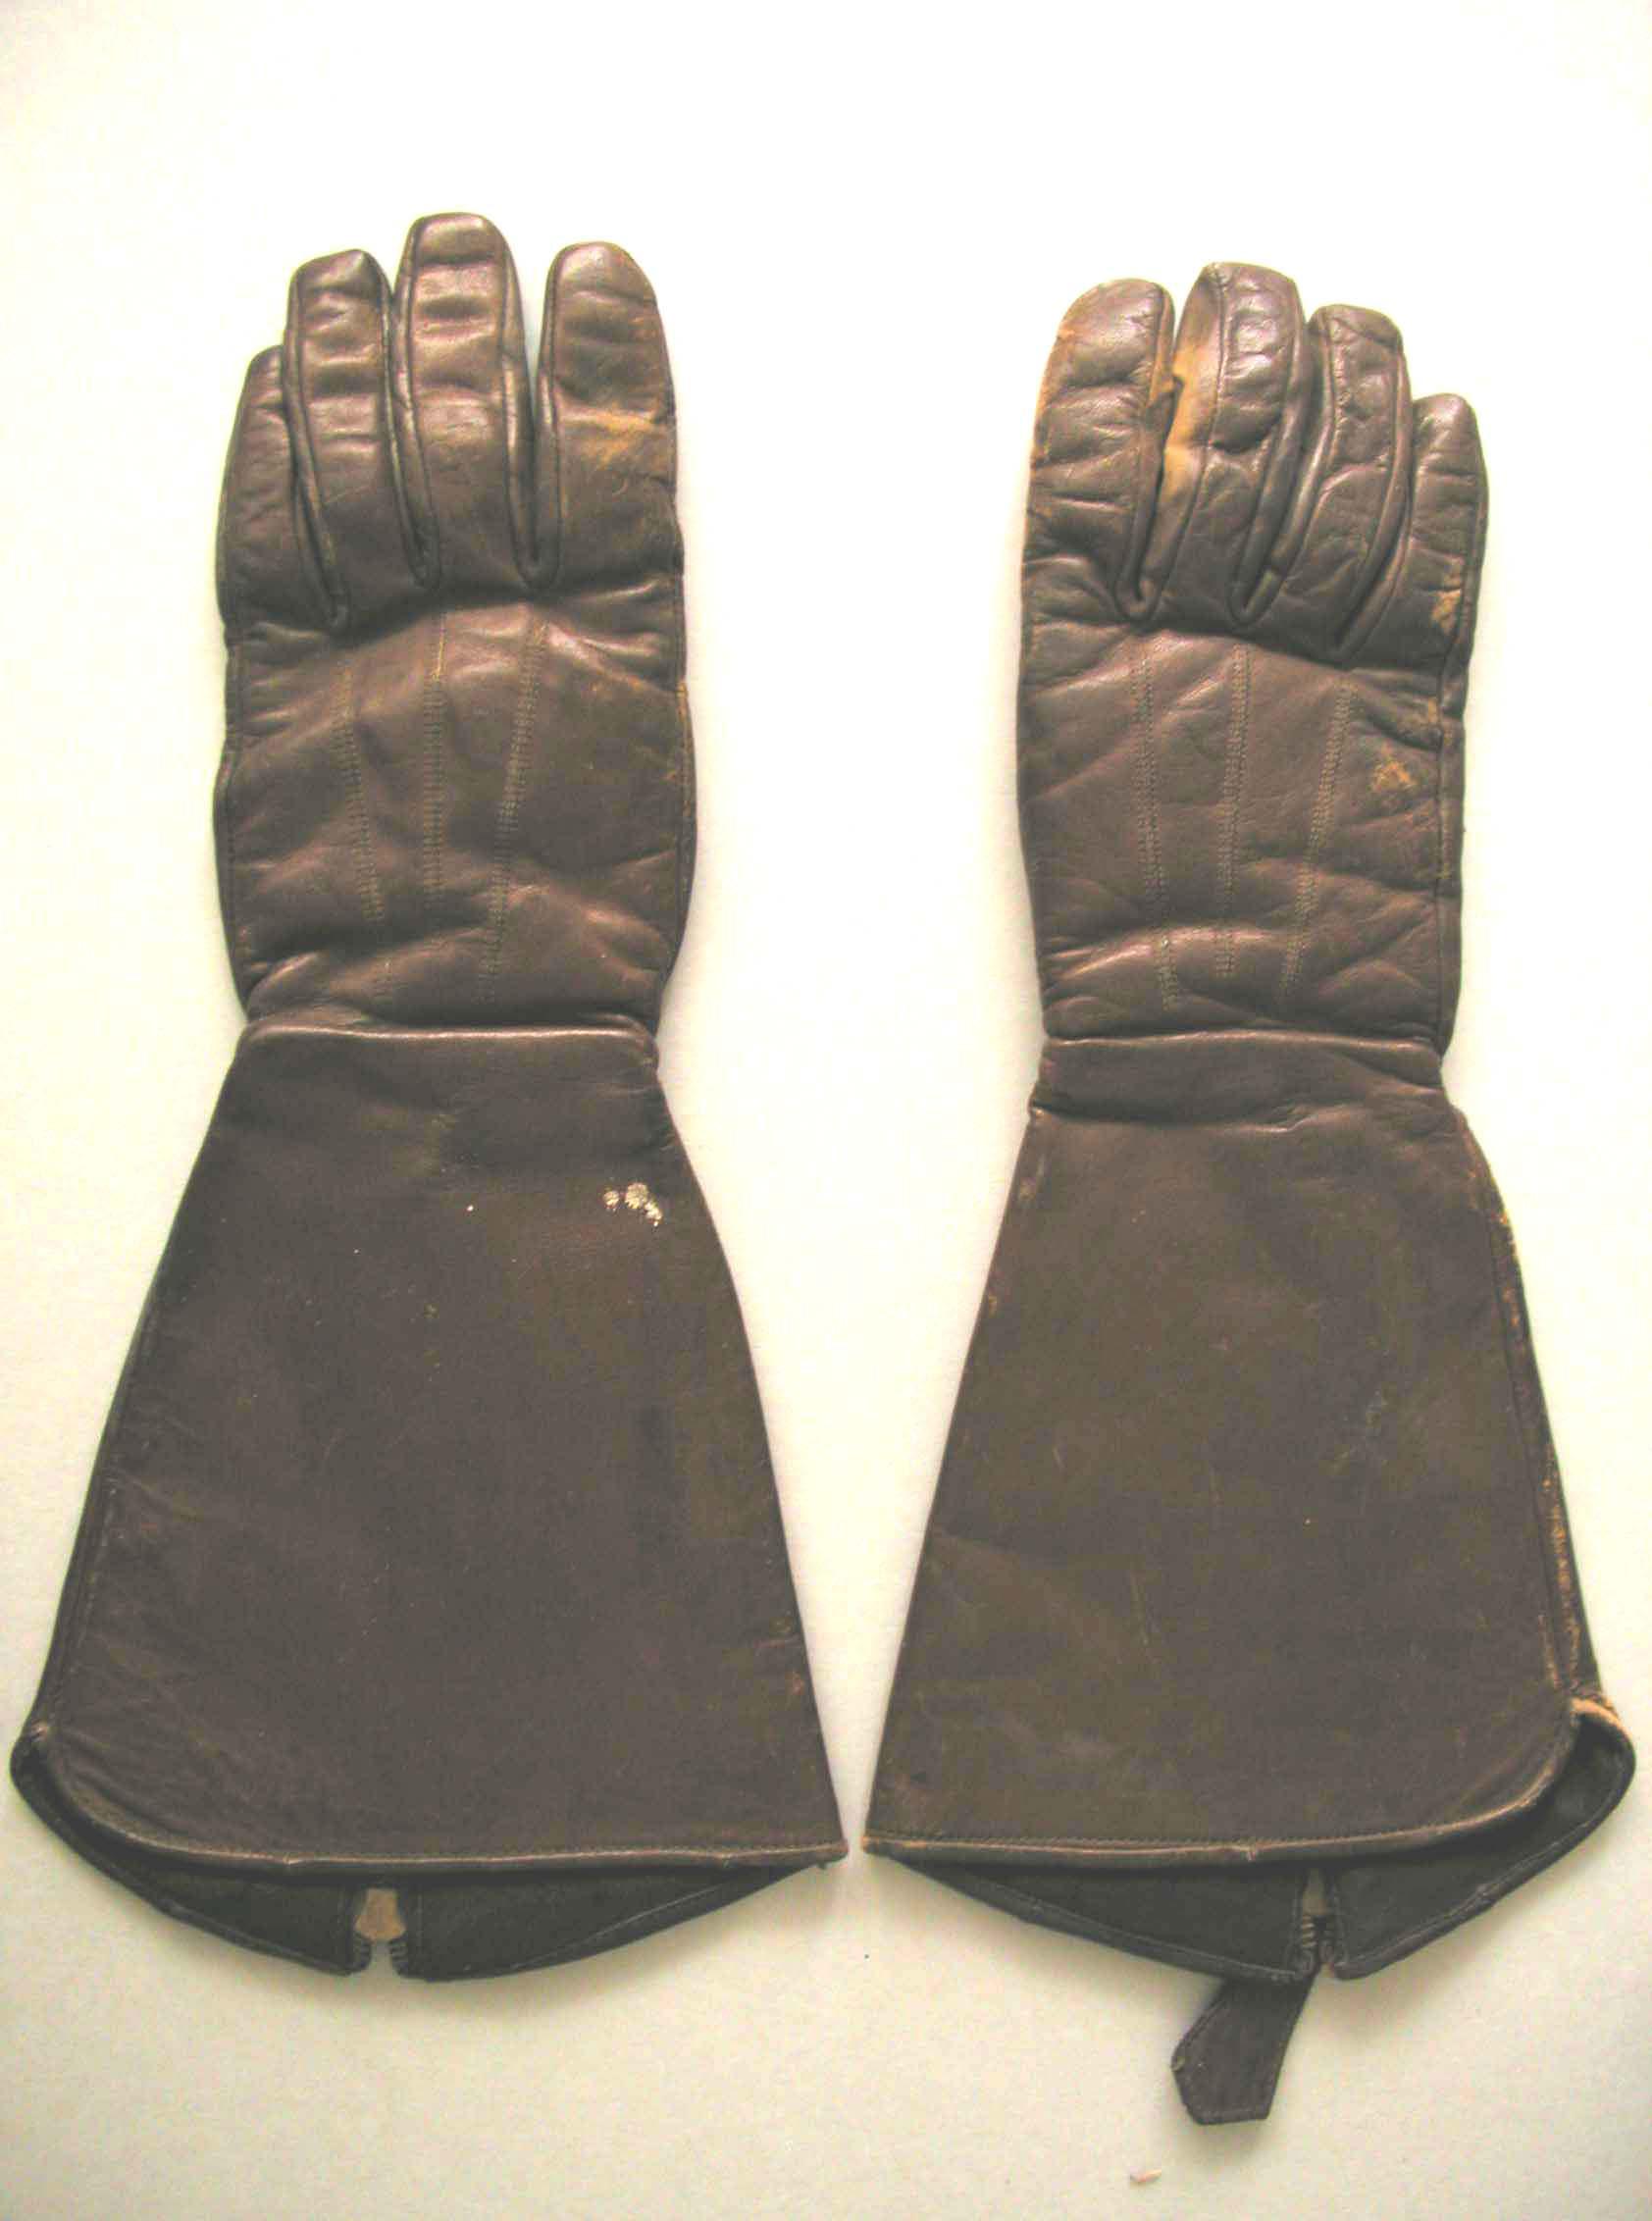 File:Gloves, flying (AM 2003.104.1-2).jpg - Wikimedia Commons